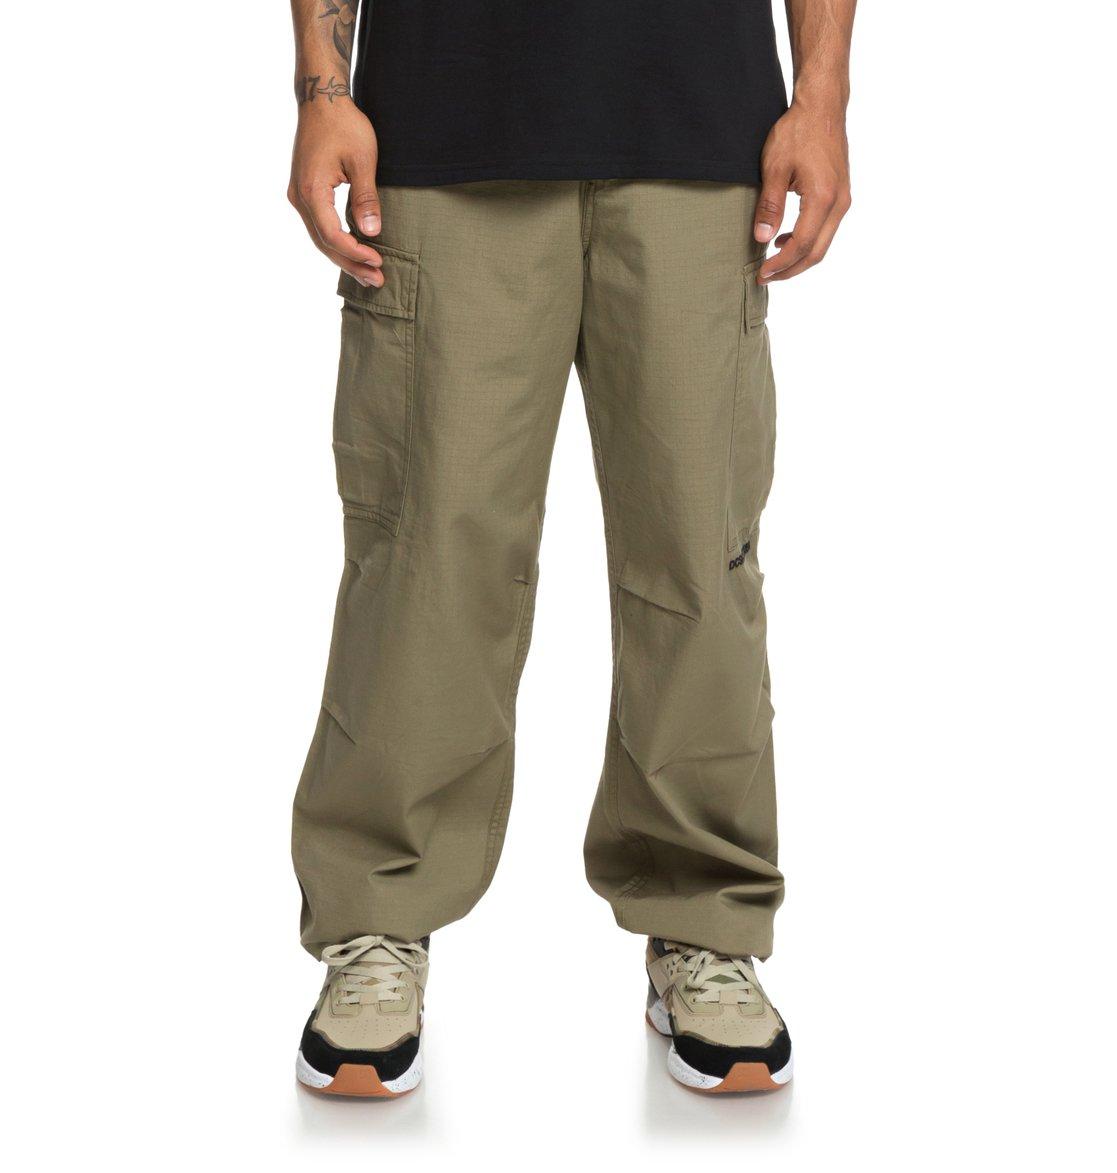 infield pantalons cargo militaires pour homme. Black Bedroom Furniture Sets. Home Design Ideas